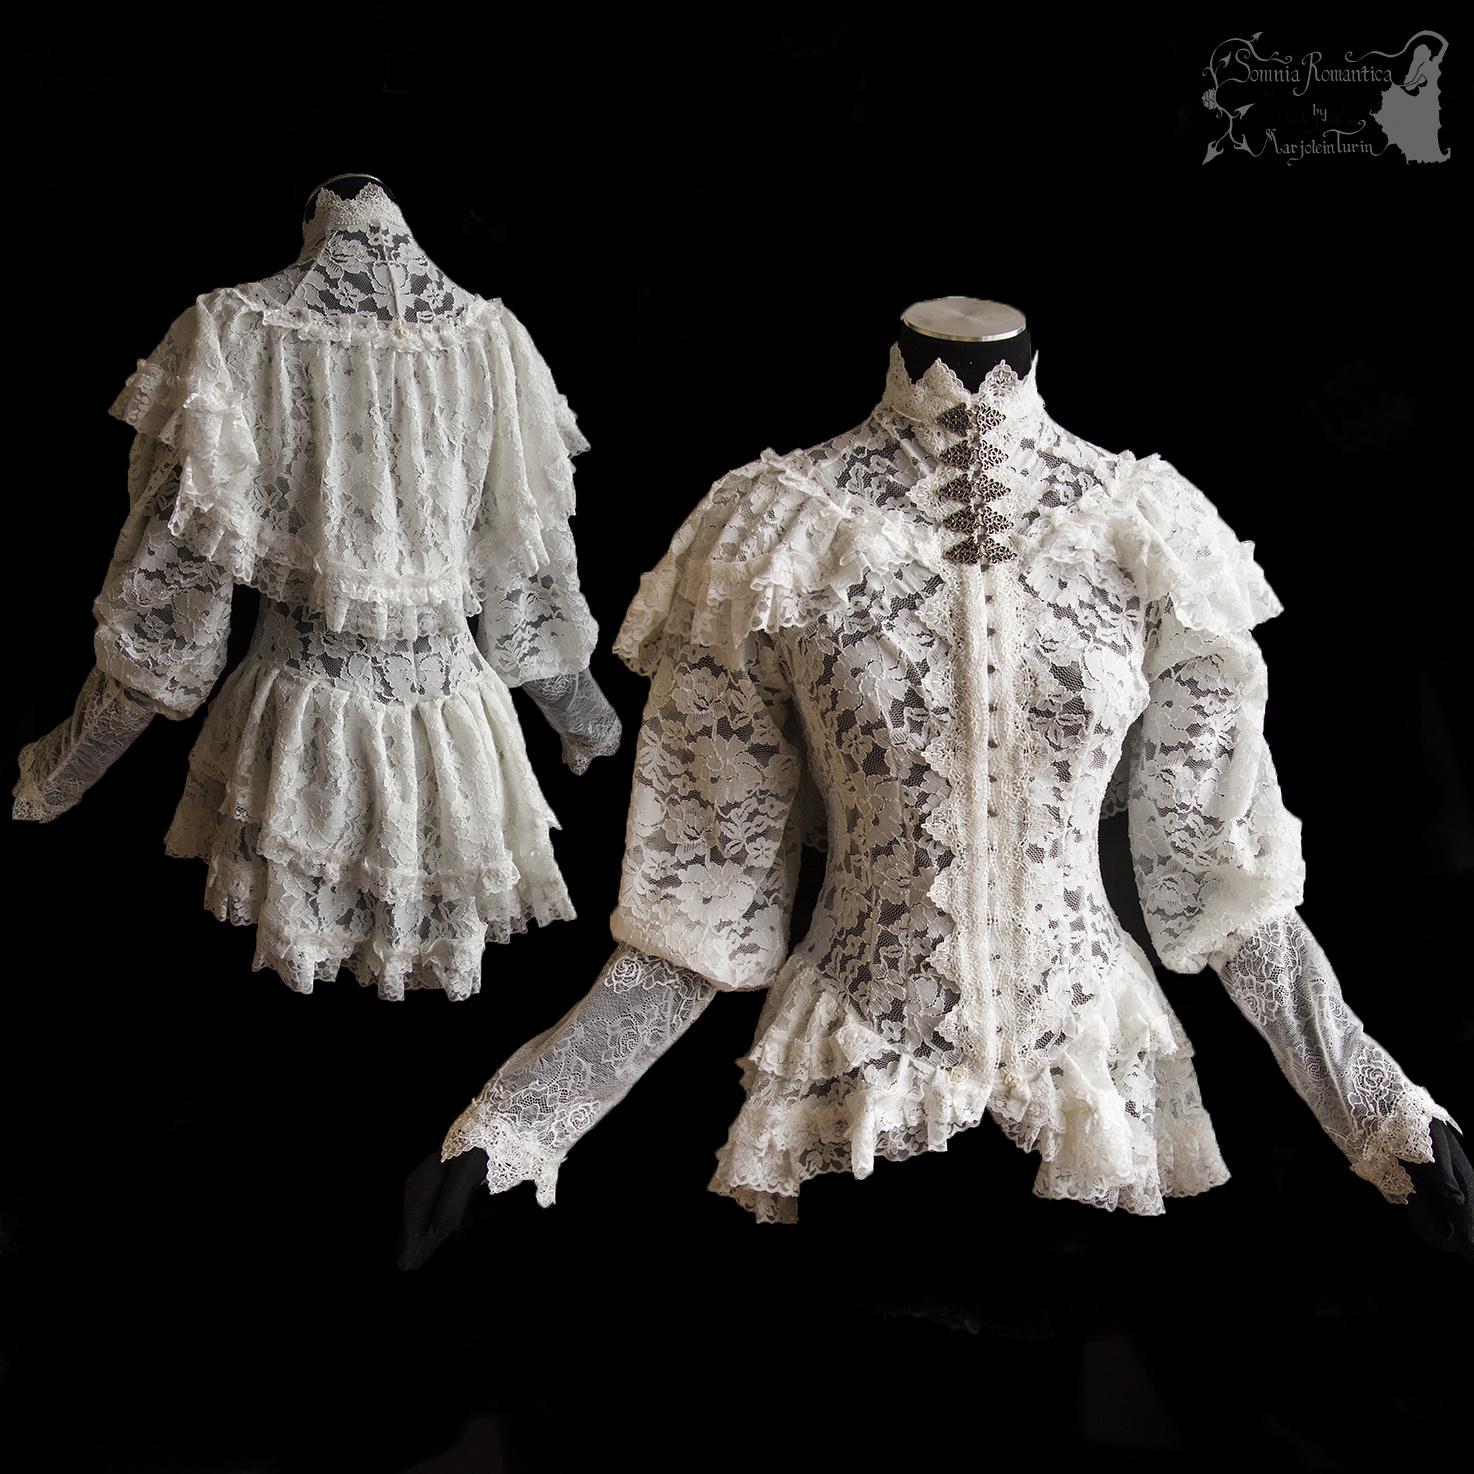 blouse-cape-somnia-romantica-marjolein-turin-2016-12-dec-12-cover-2.jpg